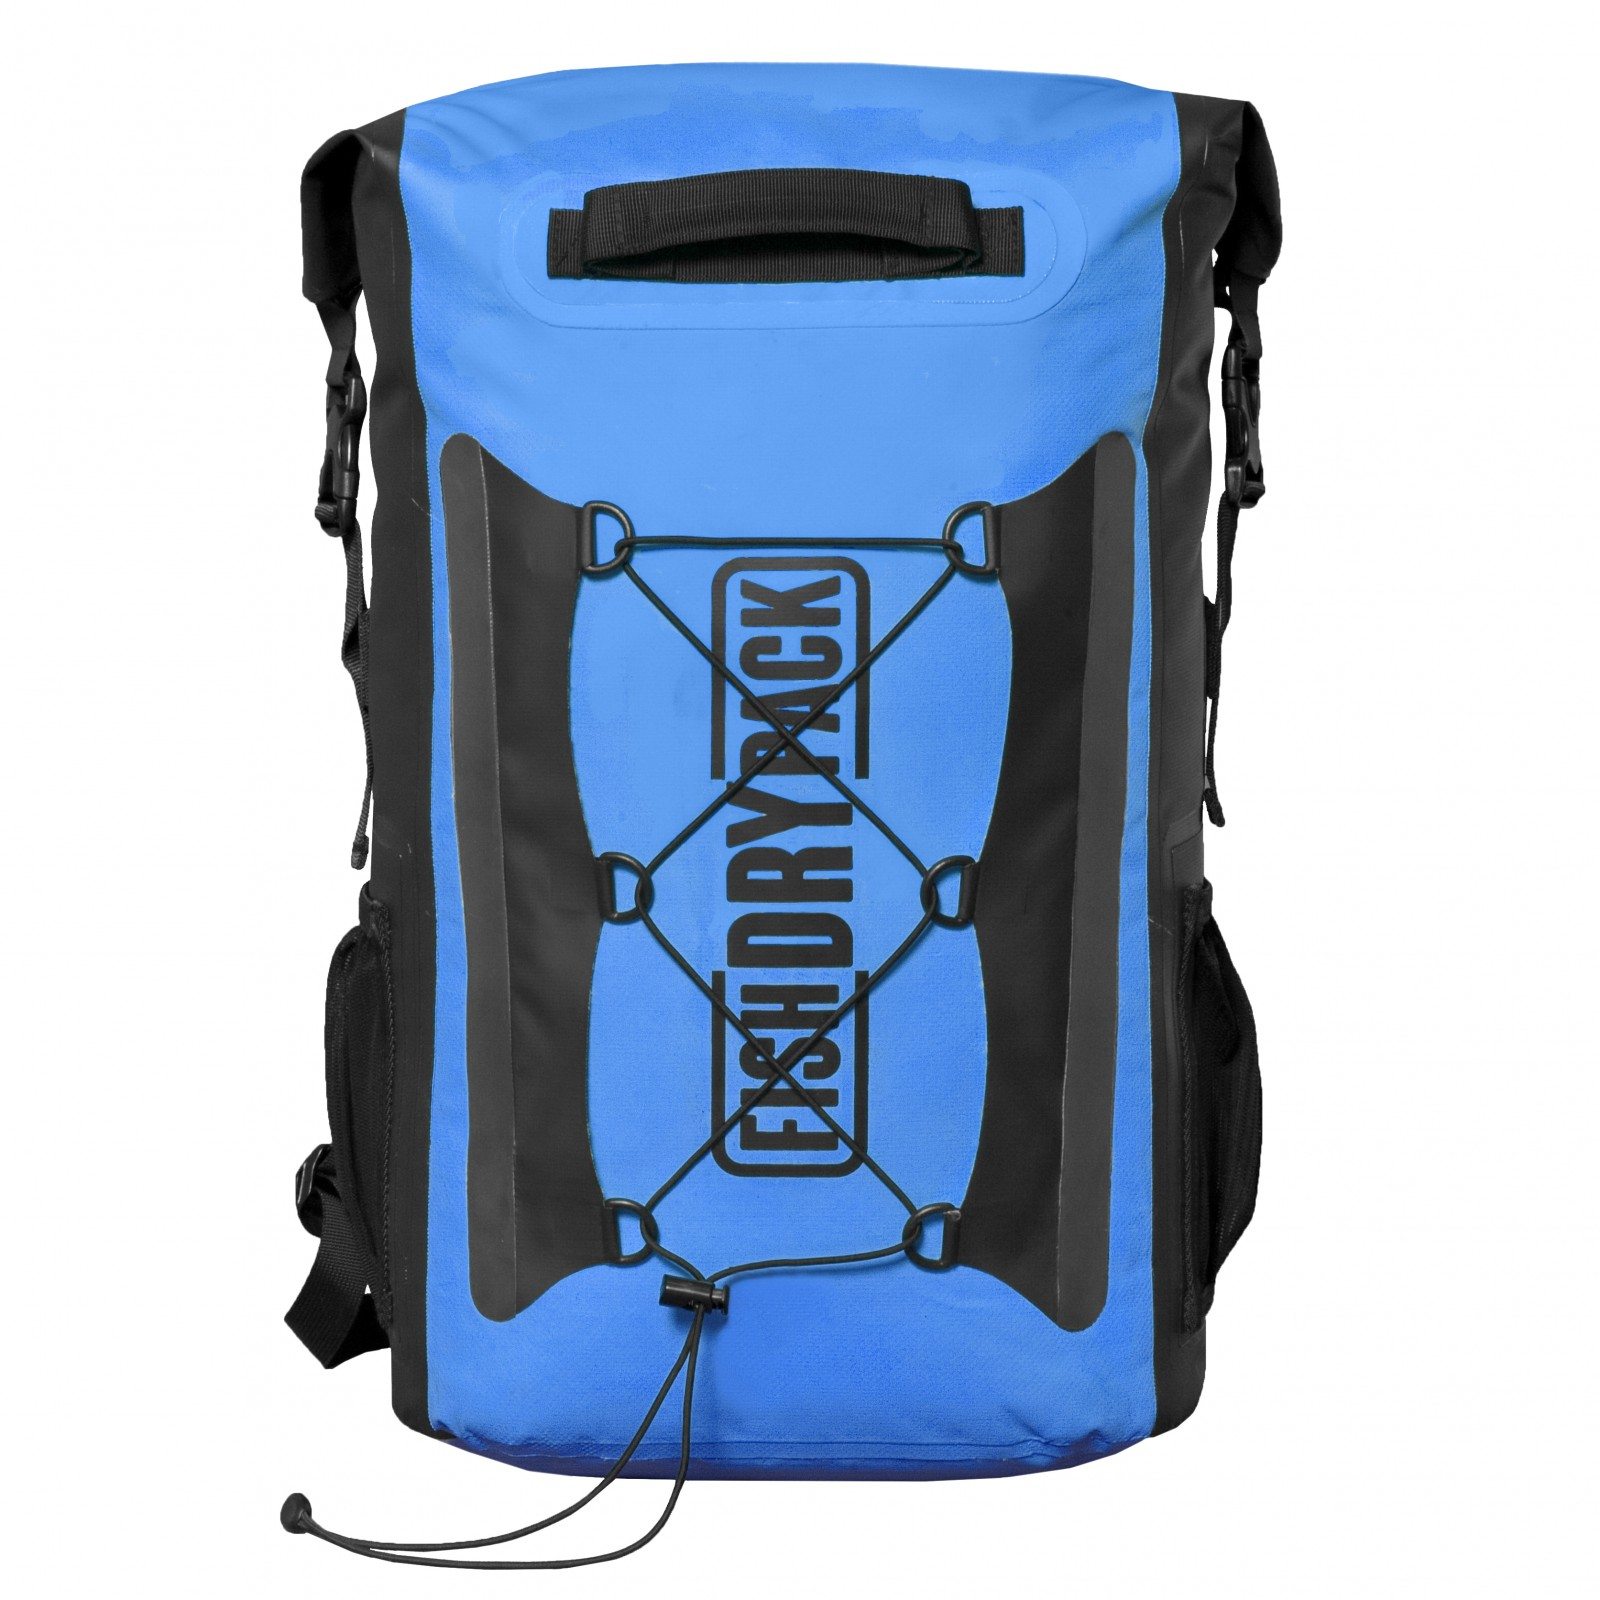 2a04ba16f9626 Plecak Explorer 40l Sky Blue - FishDryPack